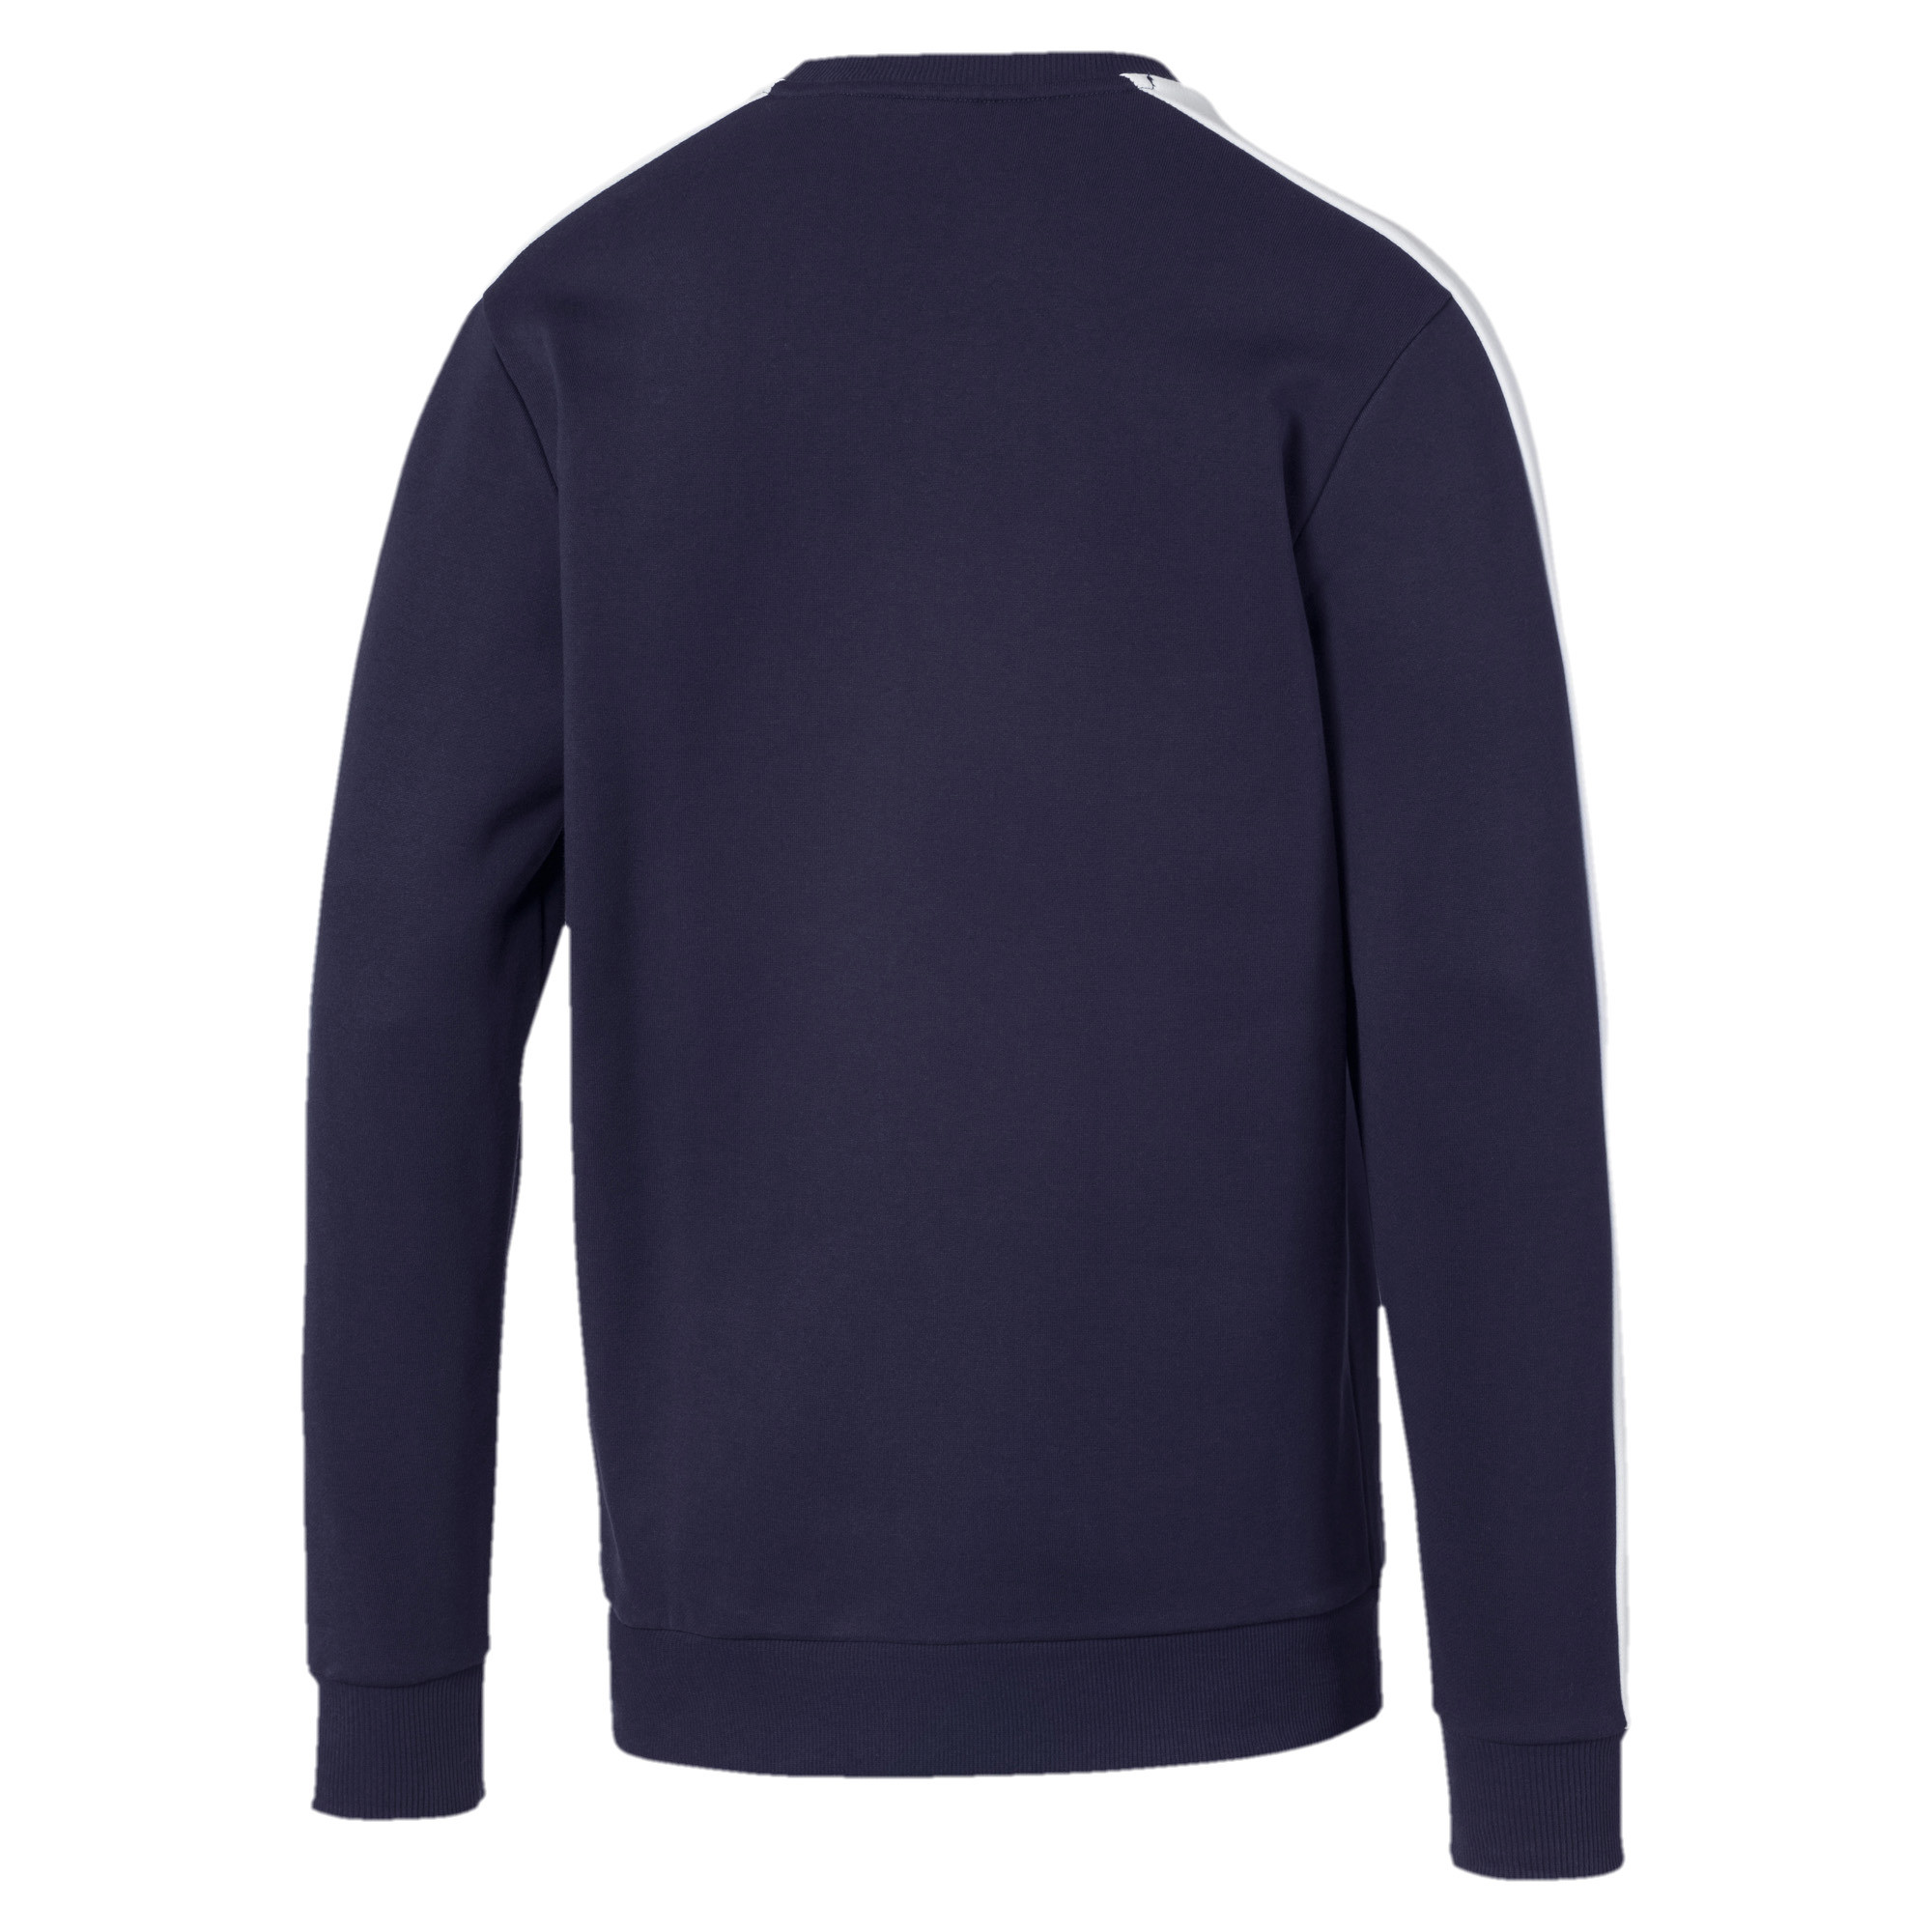 PUMA-Iconic-T7-Men-039-s-Fleece-Crewneck-Sweatshirt-Men-Sweat-Sport-Classics thumbnail 3